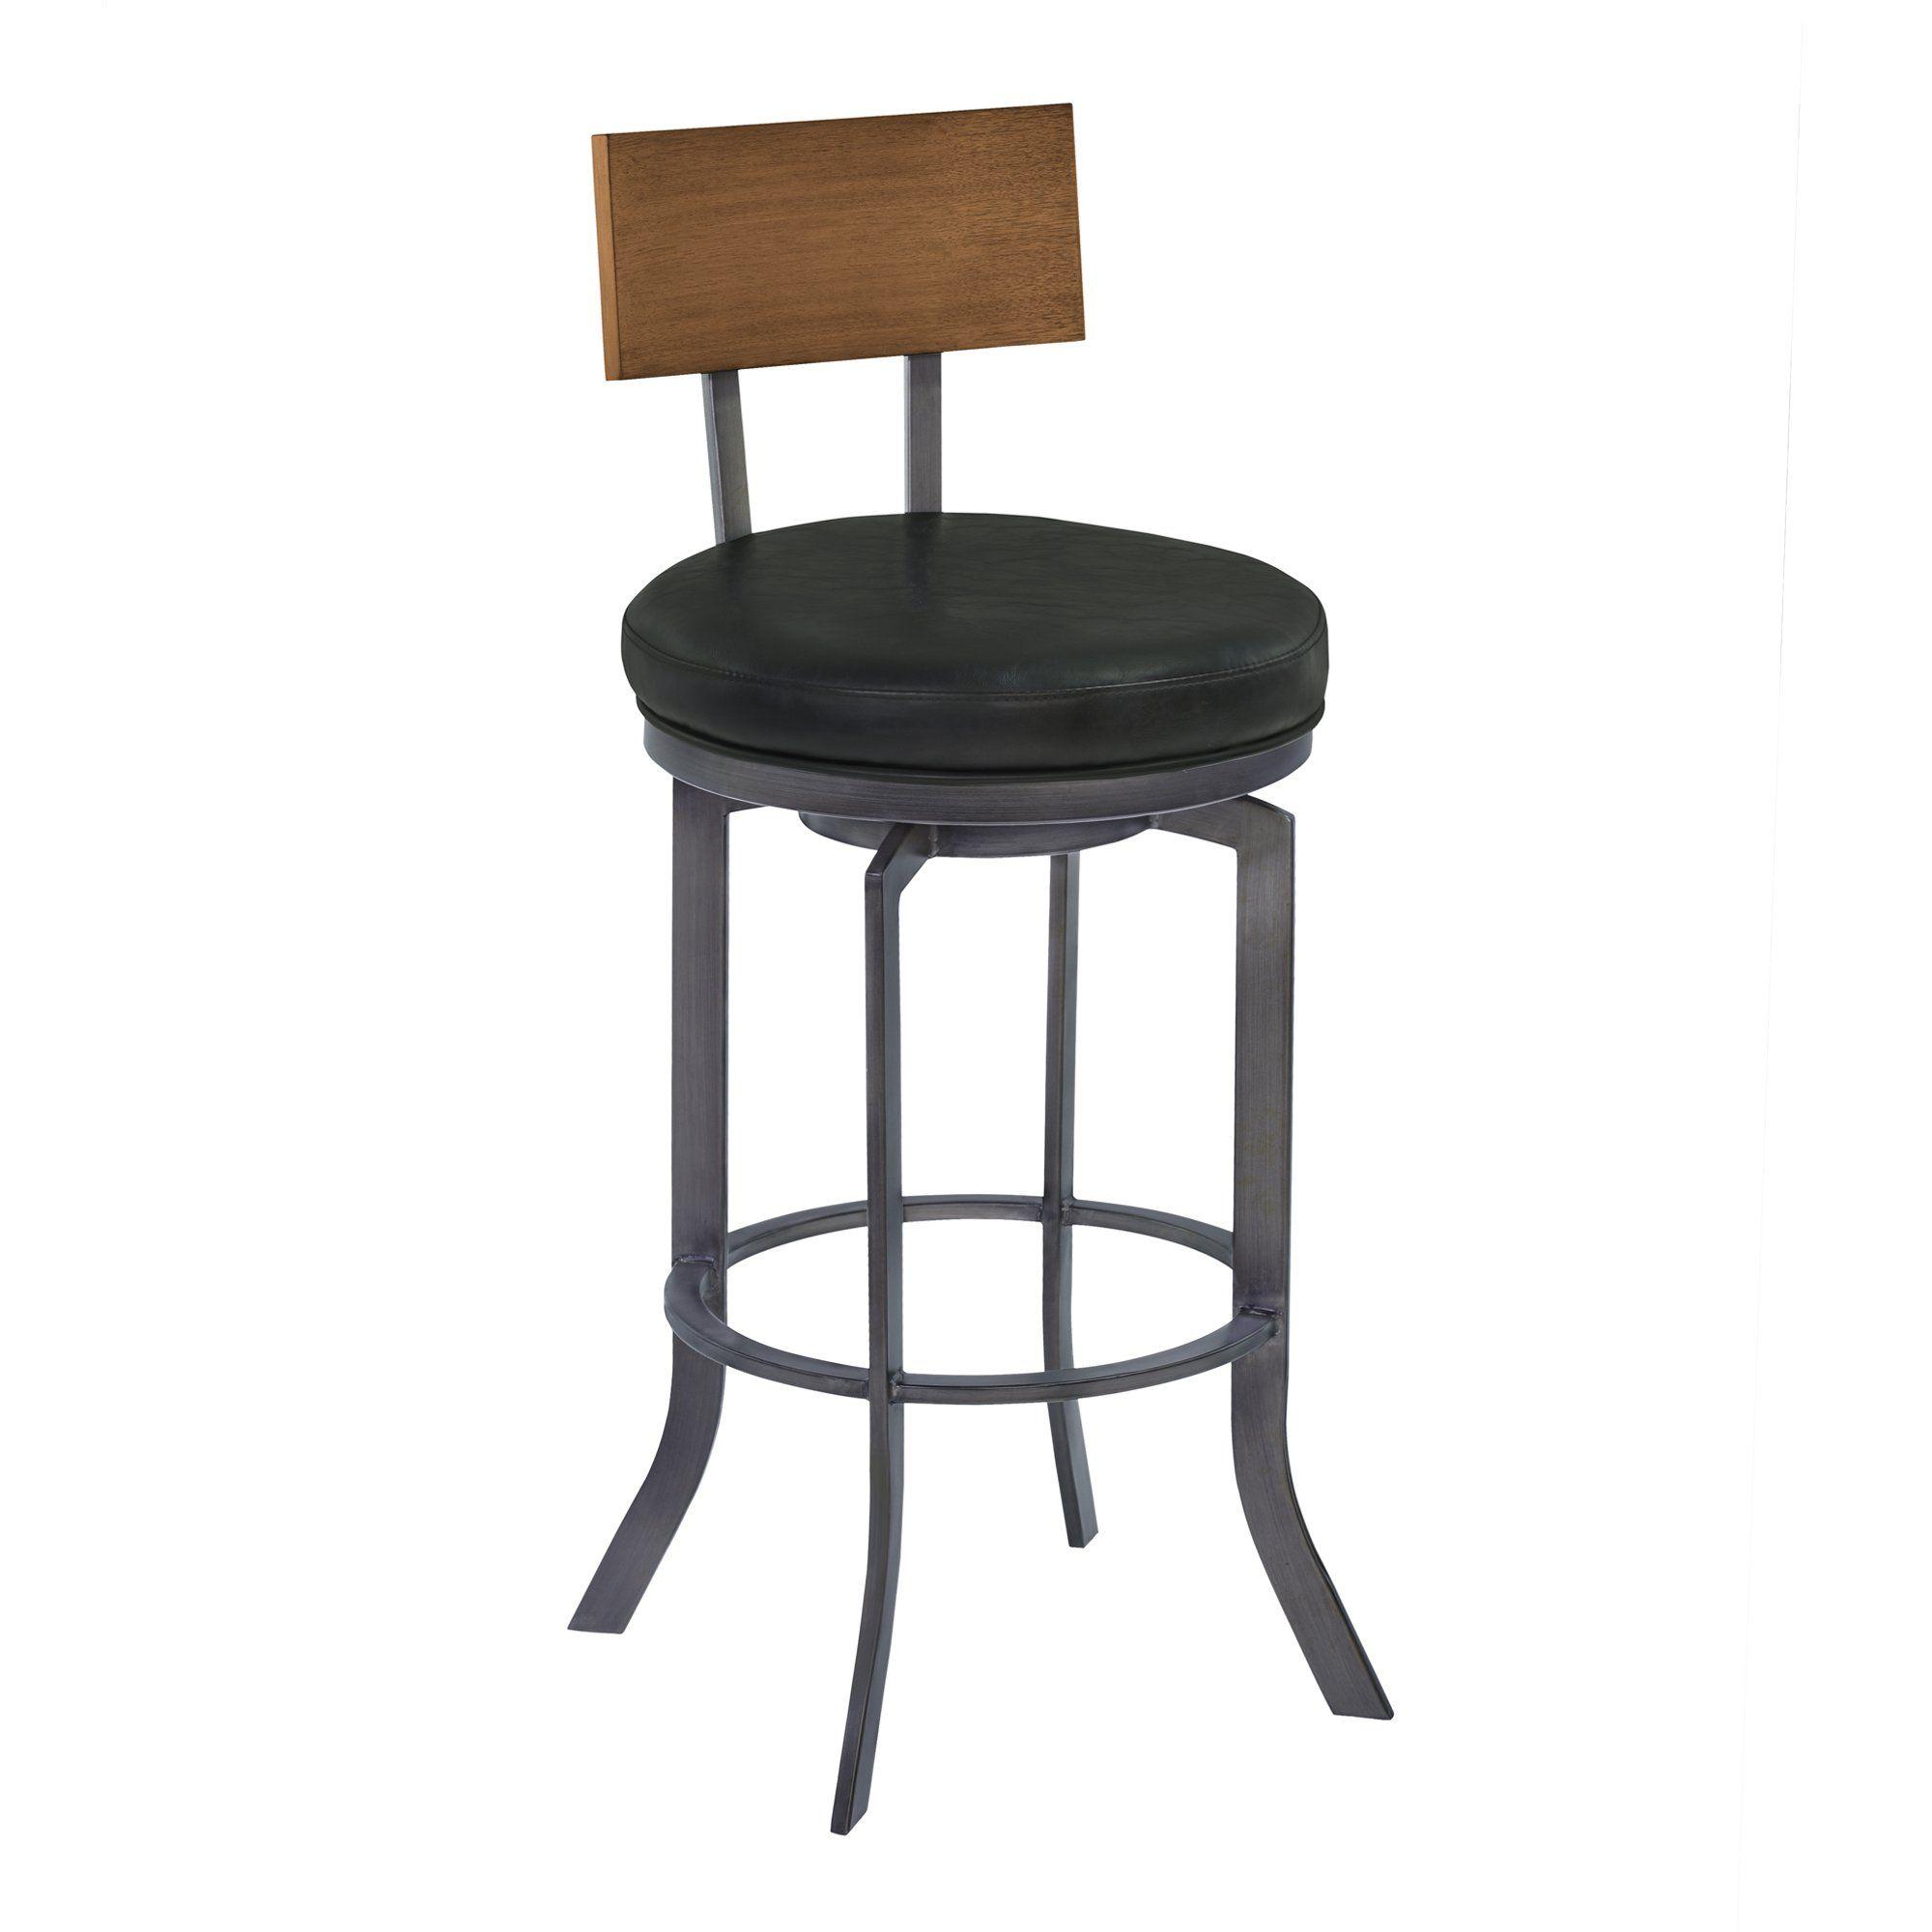 Excellent Armen Living Lcojbavb30 Ojai 30 Bar Height Metal Swivel Theyellowbook Wood Chair Design Ideas Theyellowbookinfo